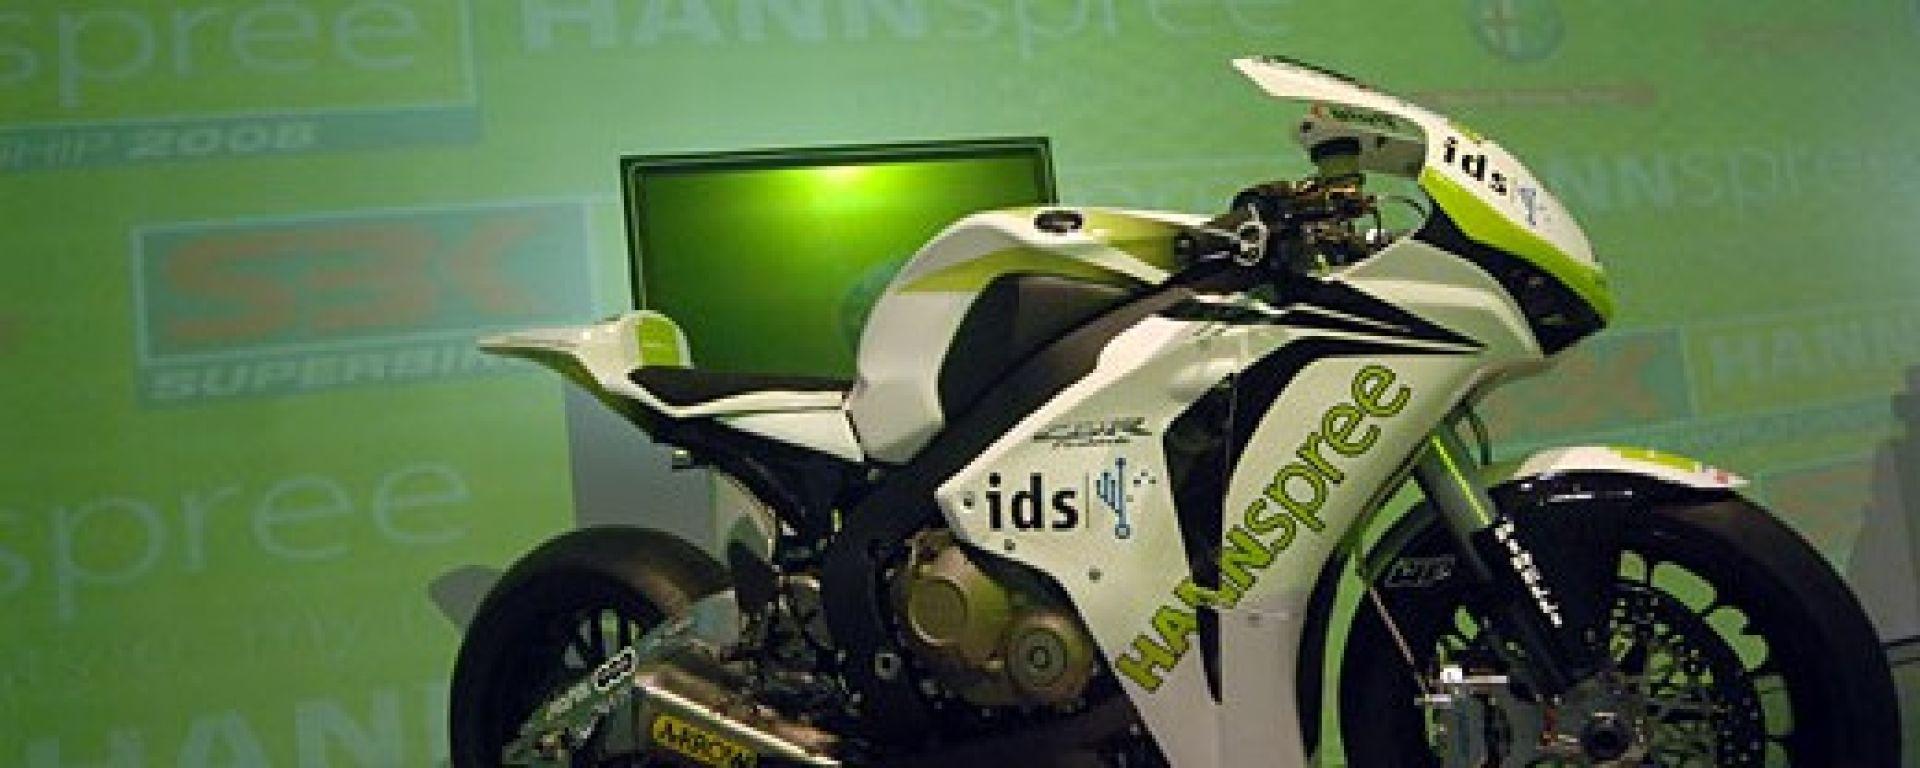 Mondiale Superbike 2008